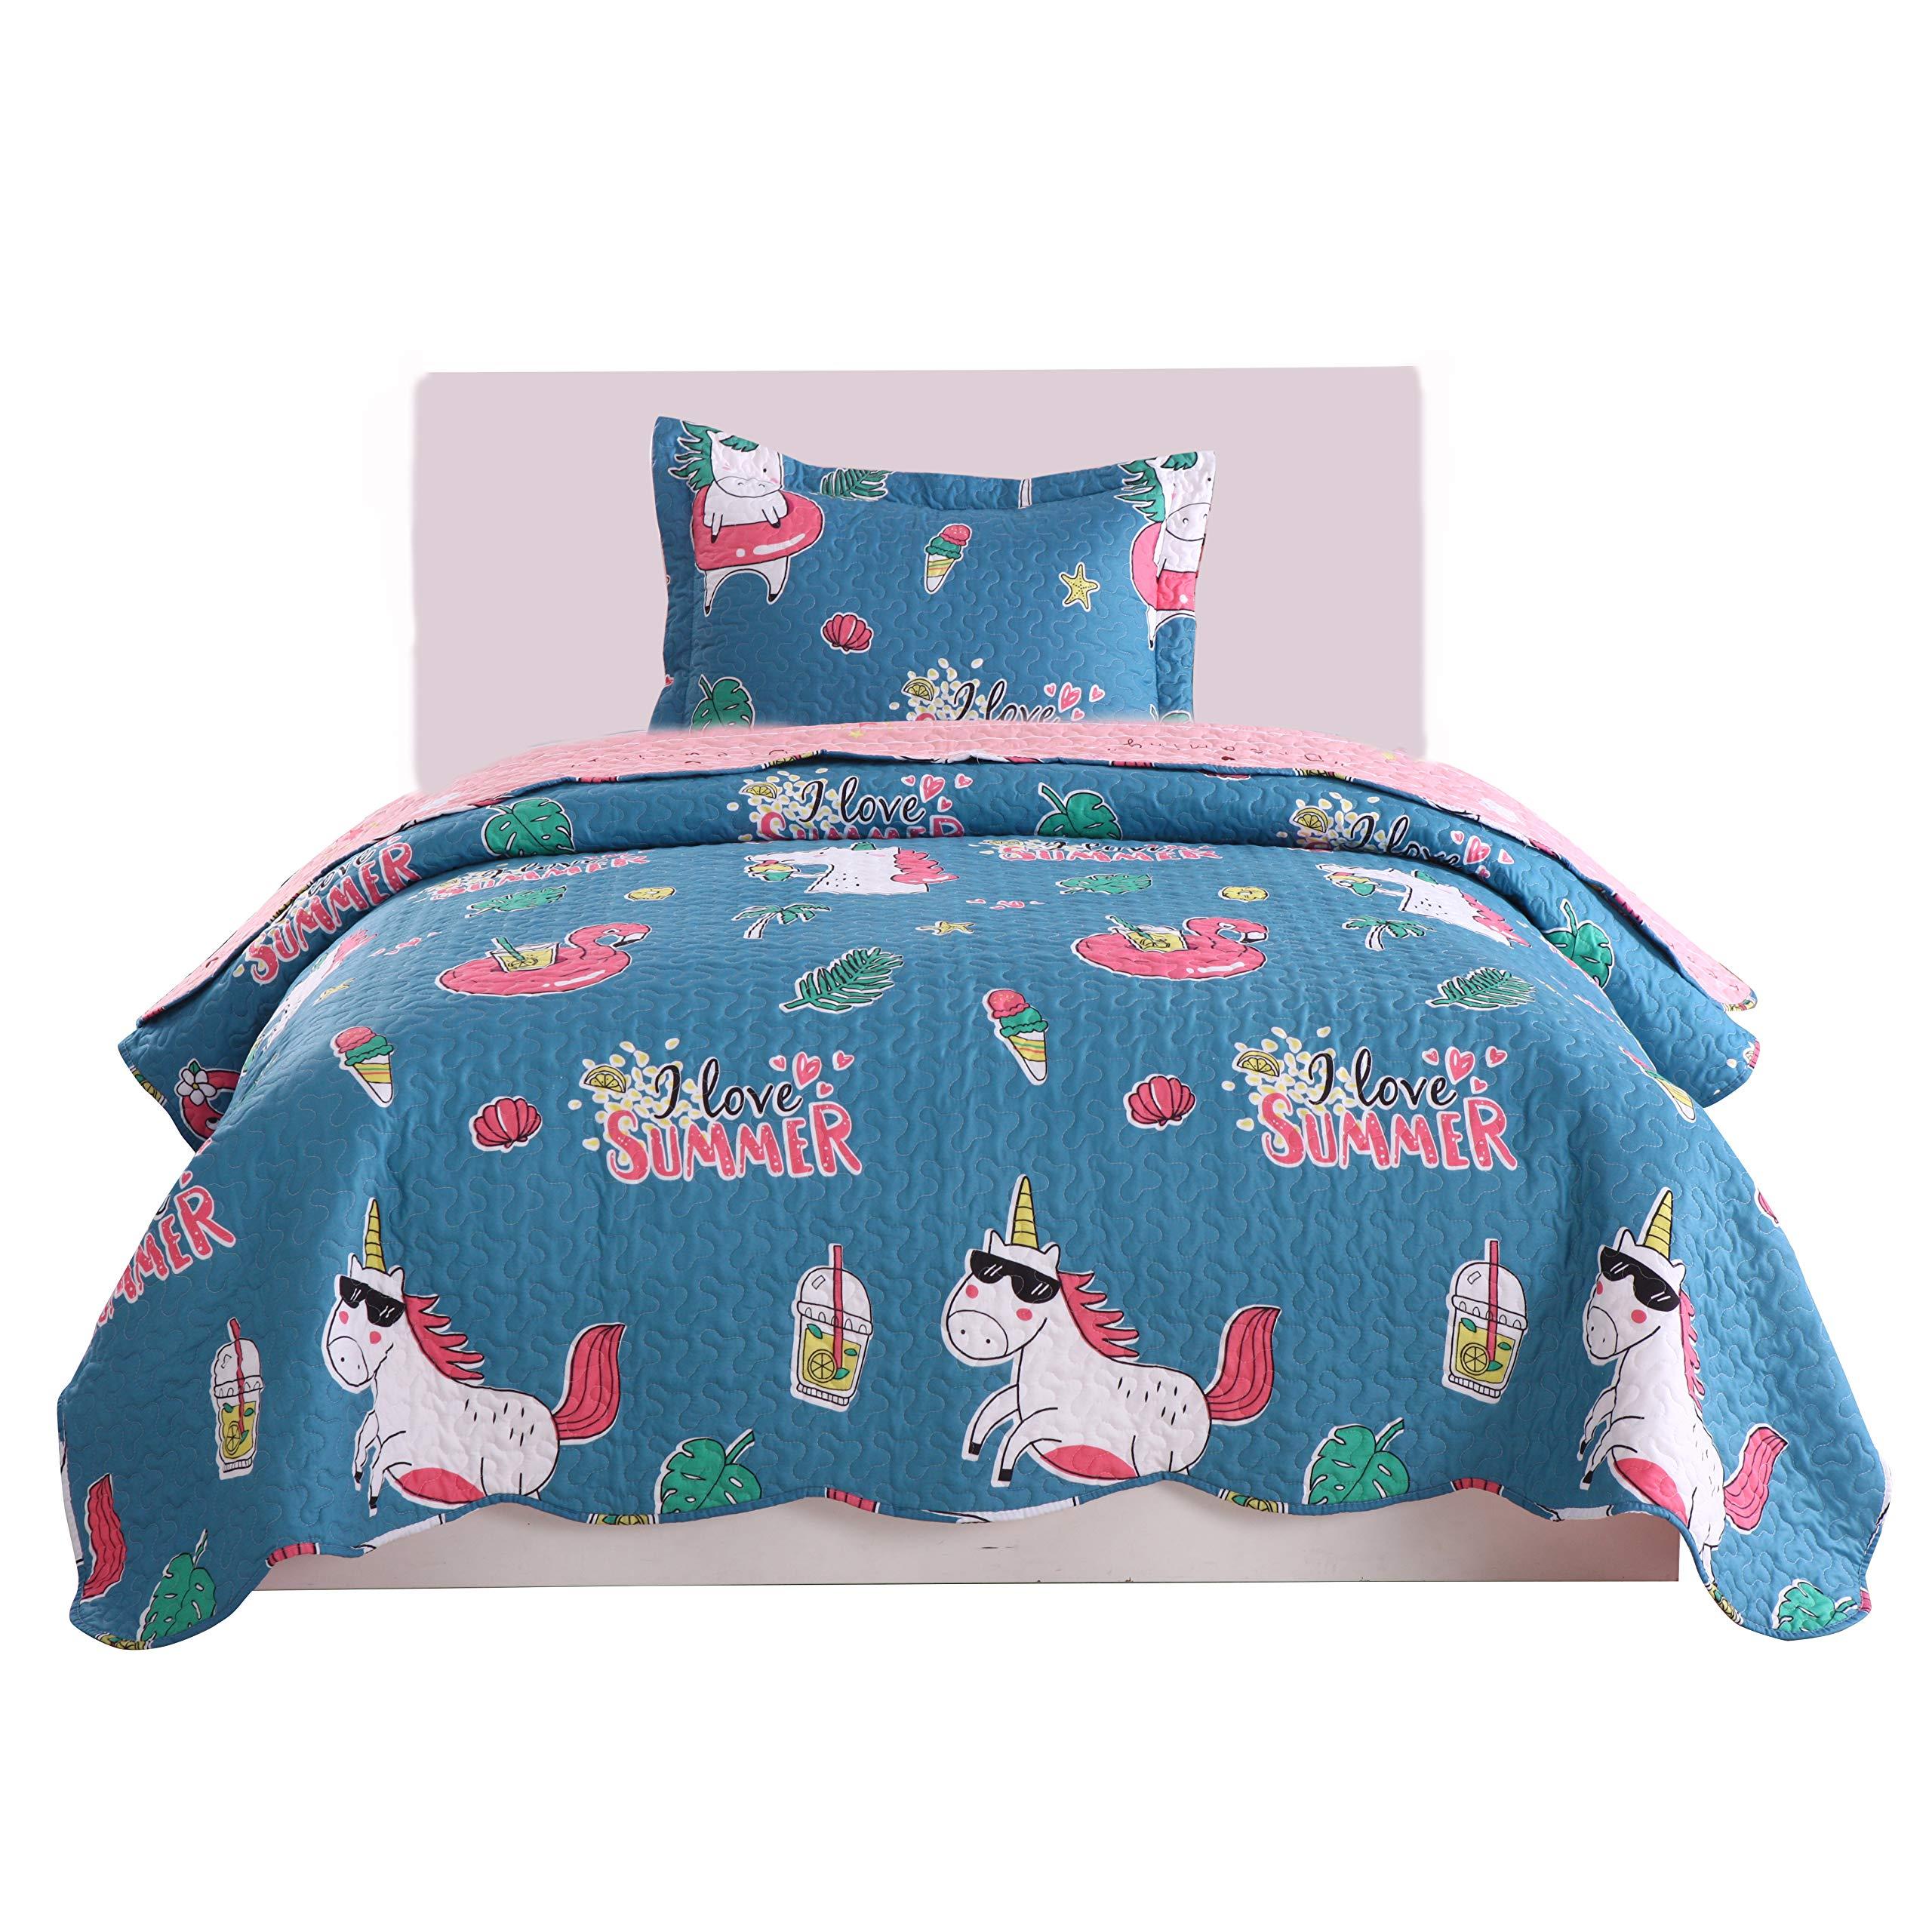 MarCielo 2 Piece Kids Quilt Set Lightweight Bedspread Throw Blanket for Teens Boys Girls Bed Printed Beach Sea Bedding Coverlet Comforter Set, 277 Fish (Twin(68''X86''))